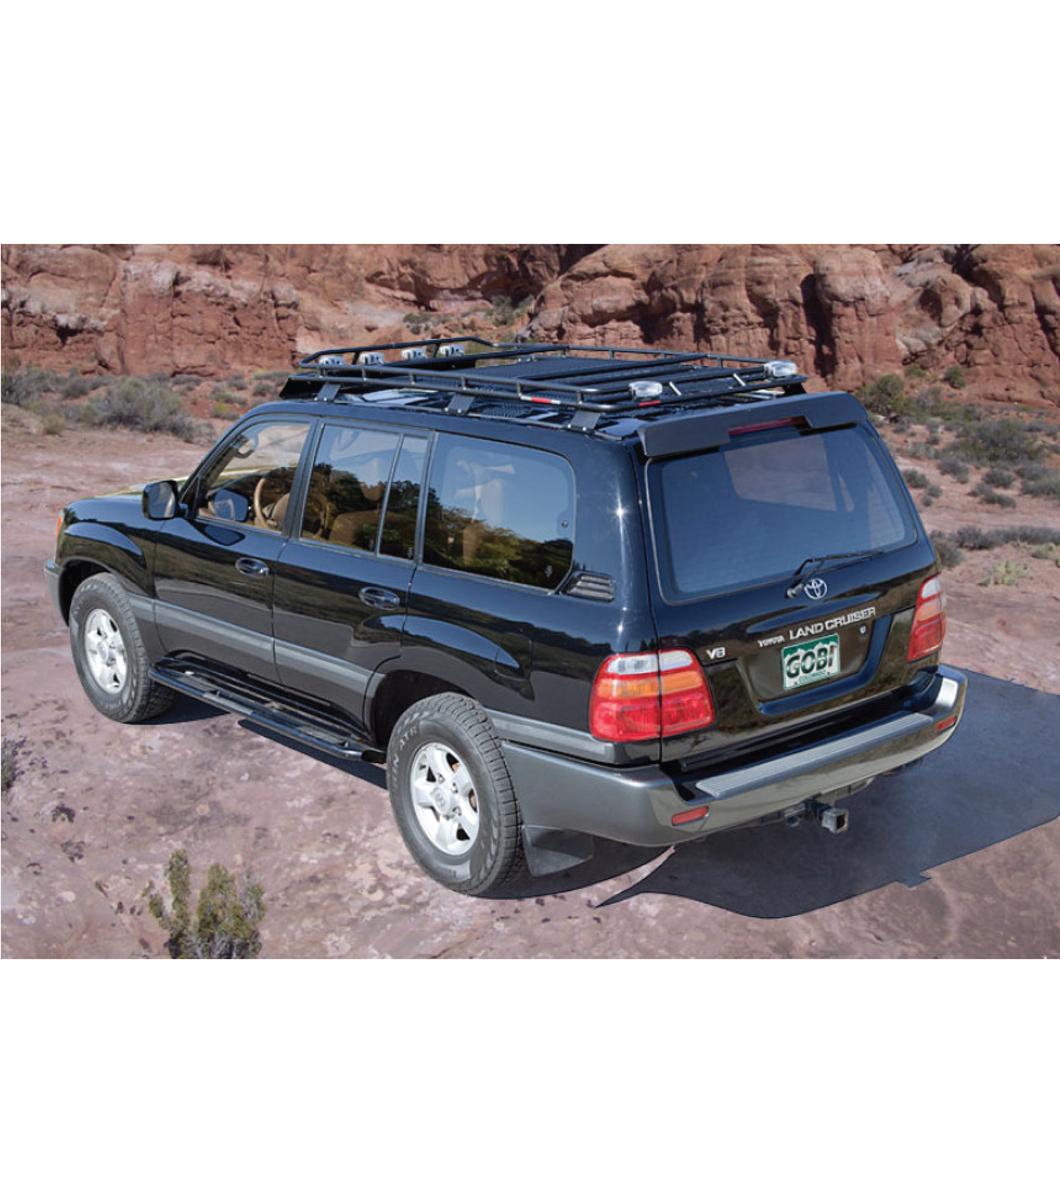 toyota land cruiser 100stealth rack multi light setup no sunroof rh gobiracks com Toyota Land Cruiser Diesel Toyota Land Cruiser Car